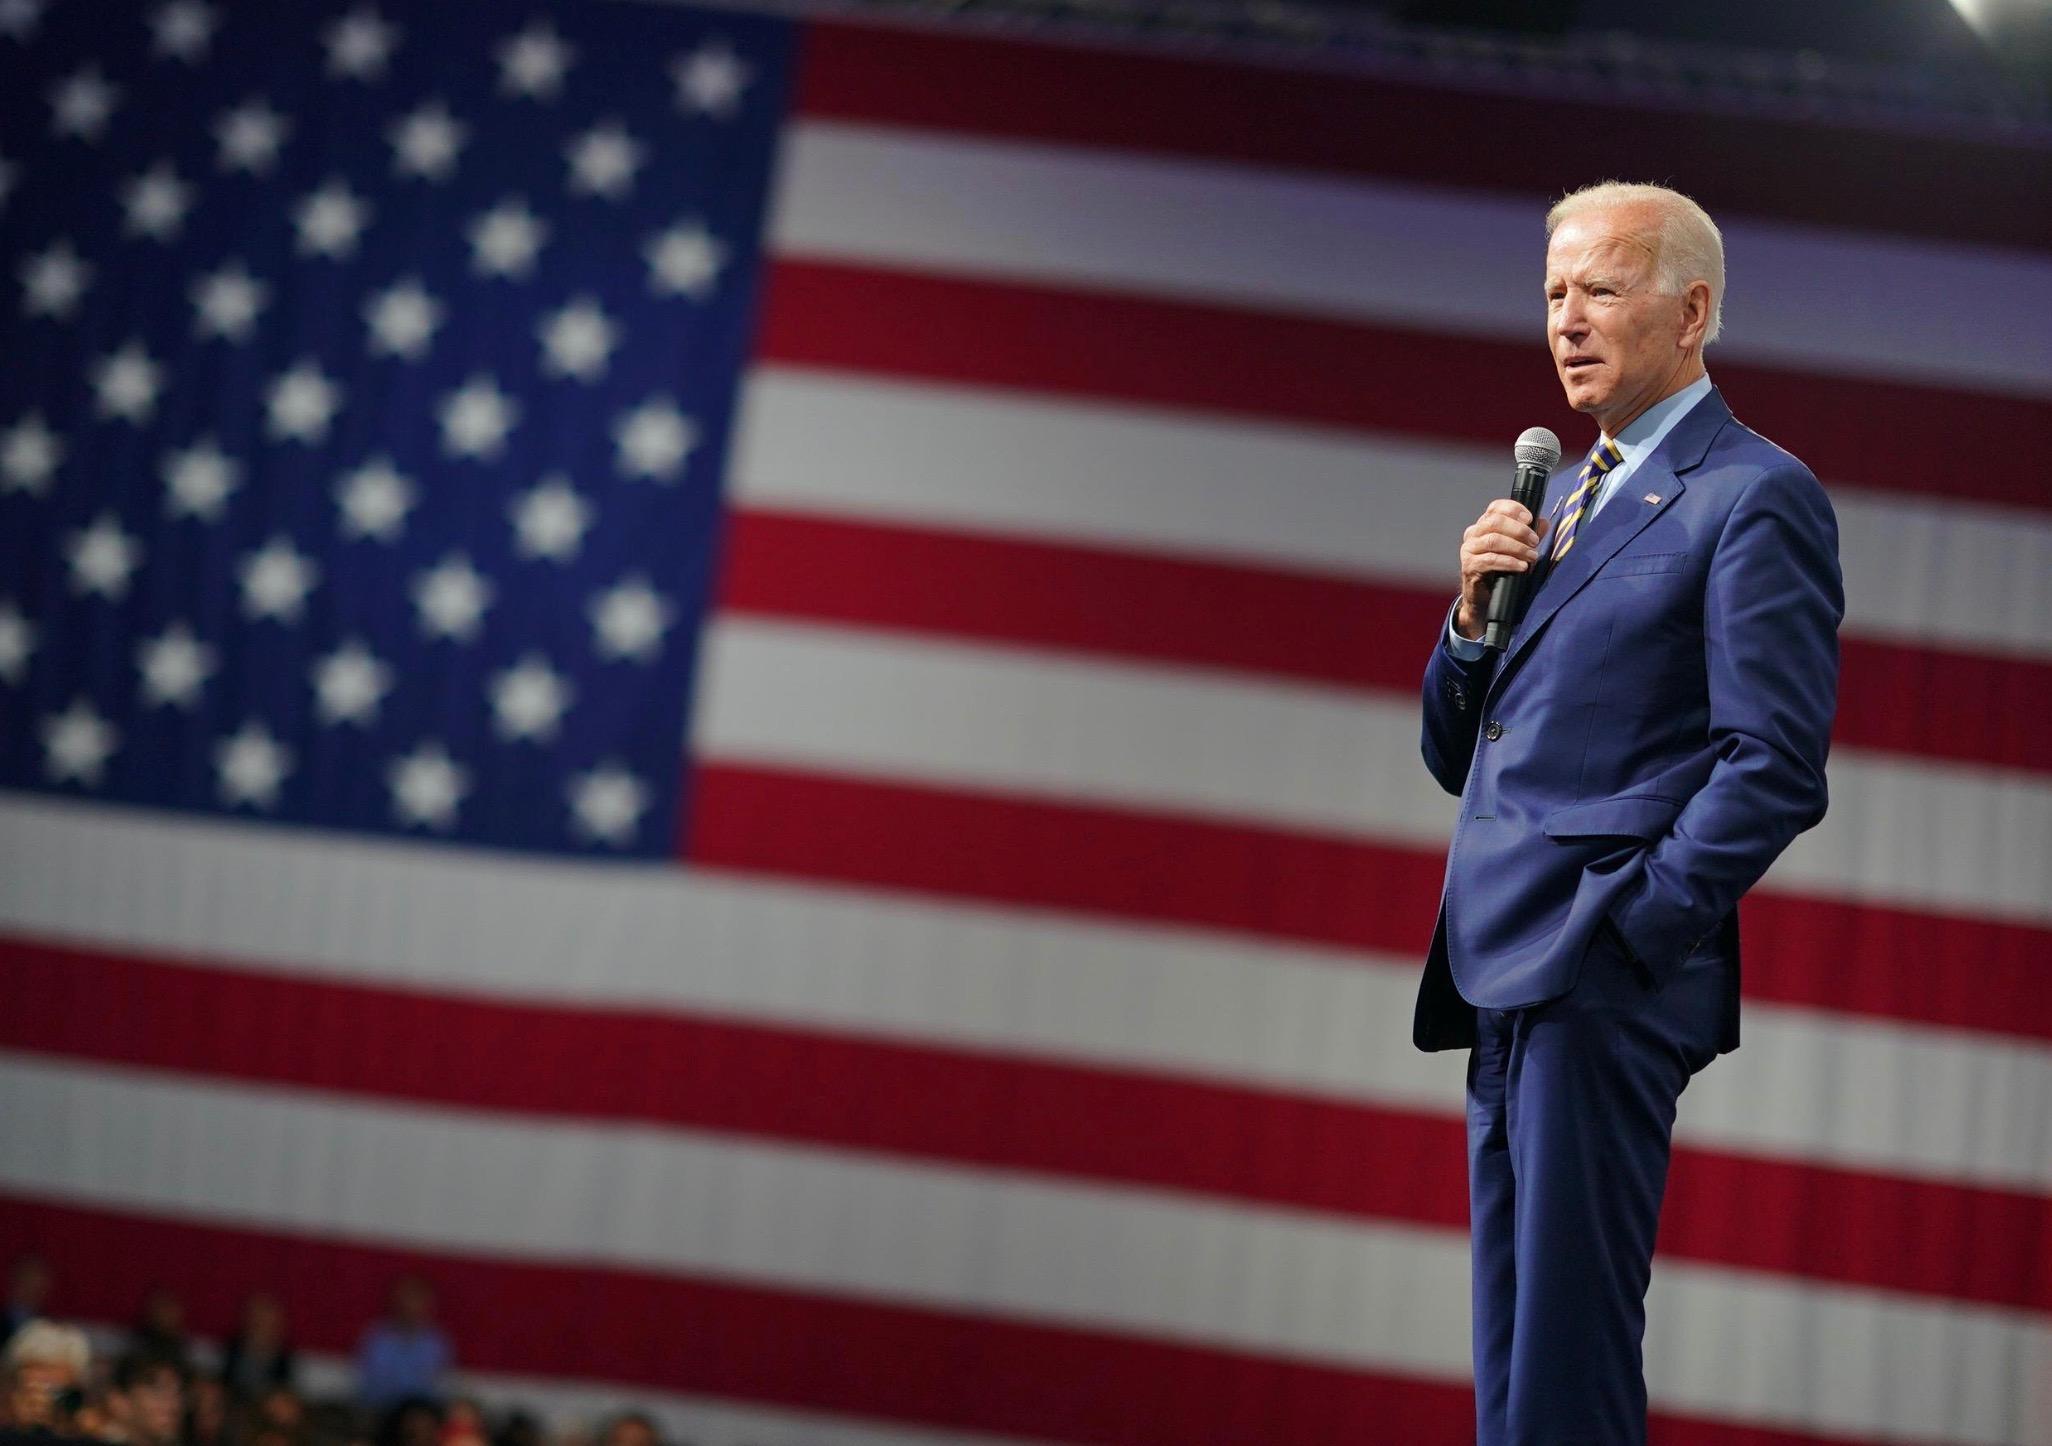 FITSNews – Joe Biden Opens Up Eight-Point Lead On Donald Trump In Latest Fox News Poll